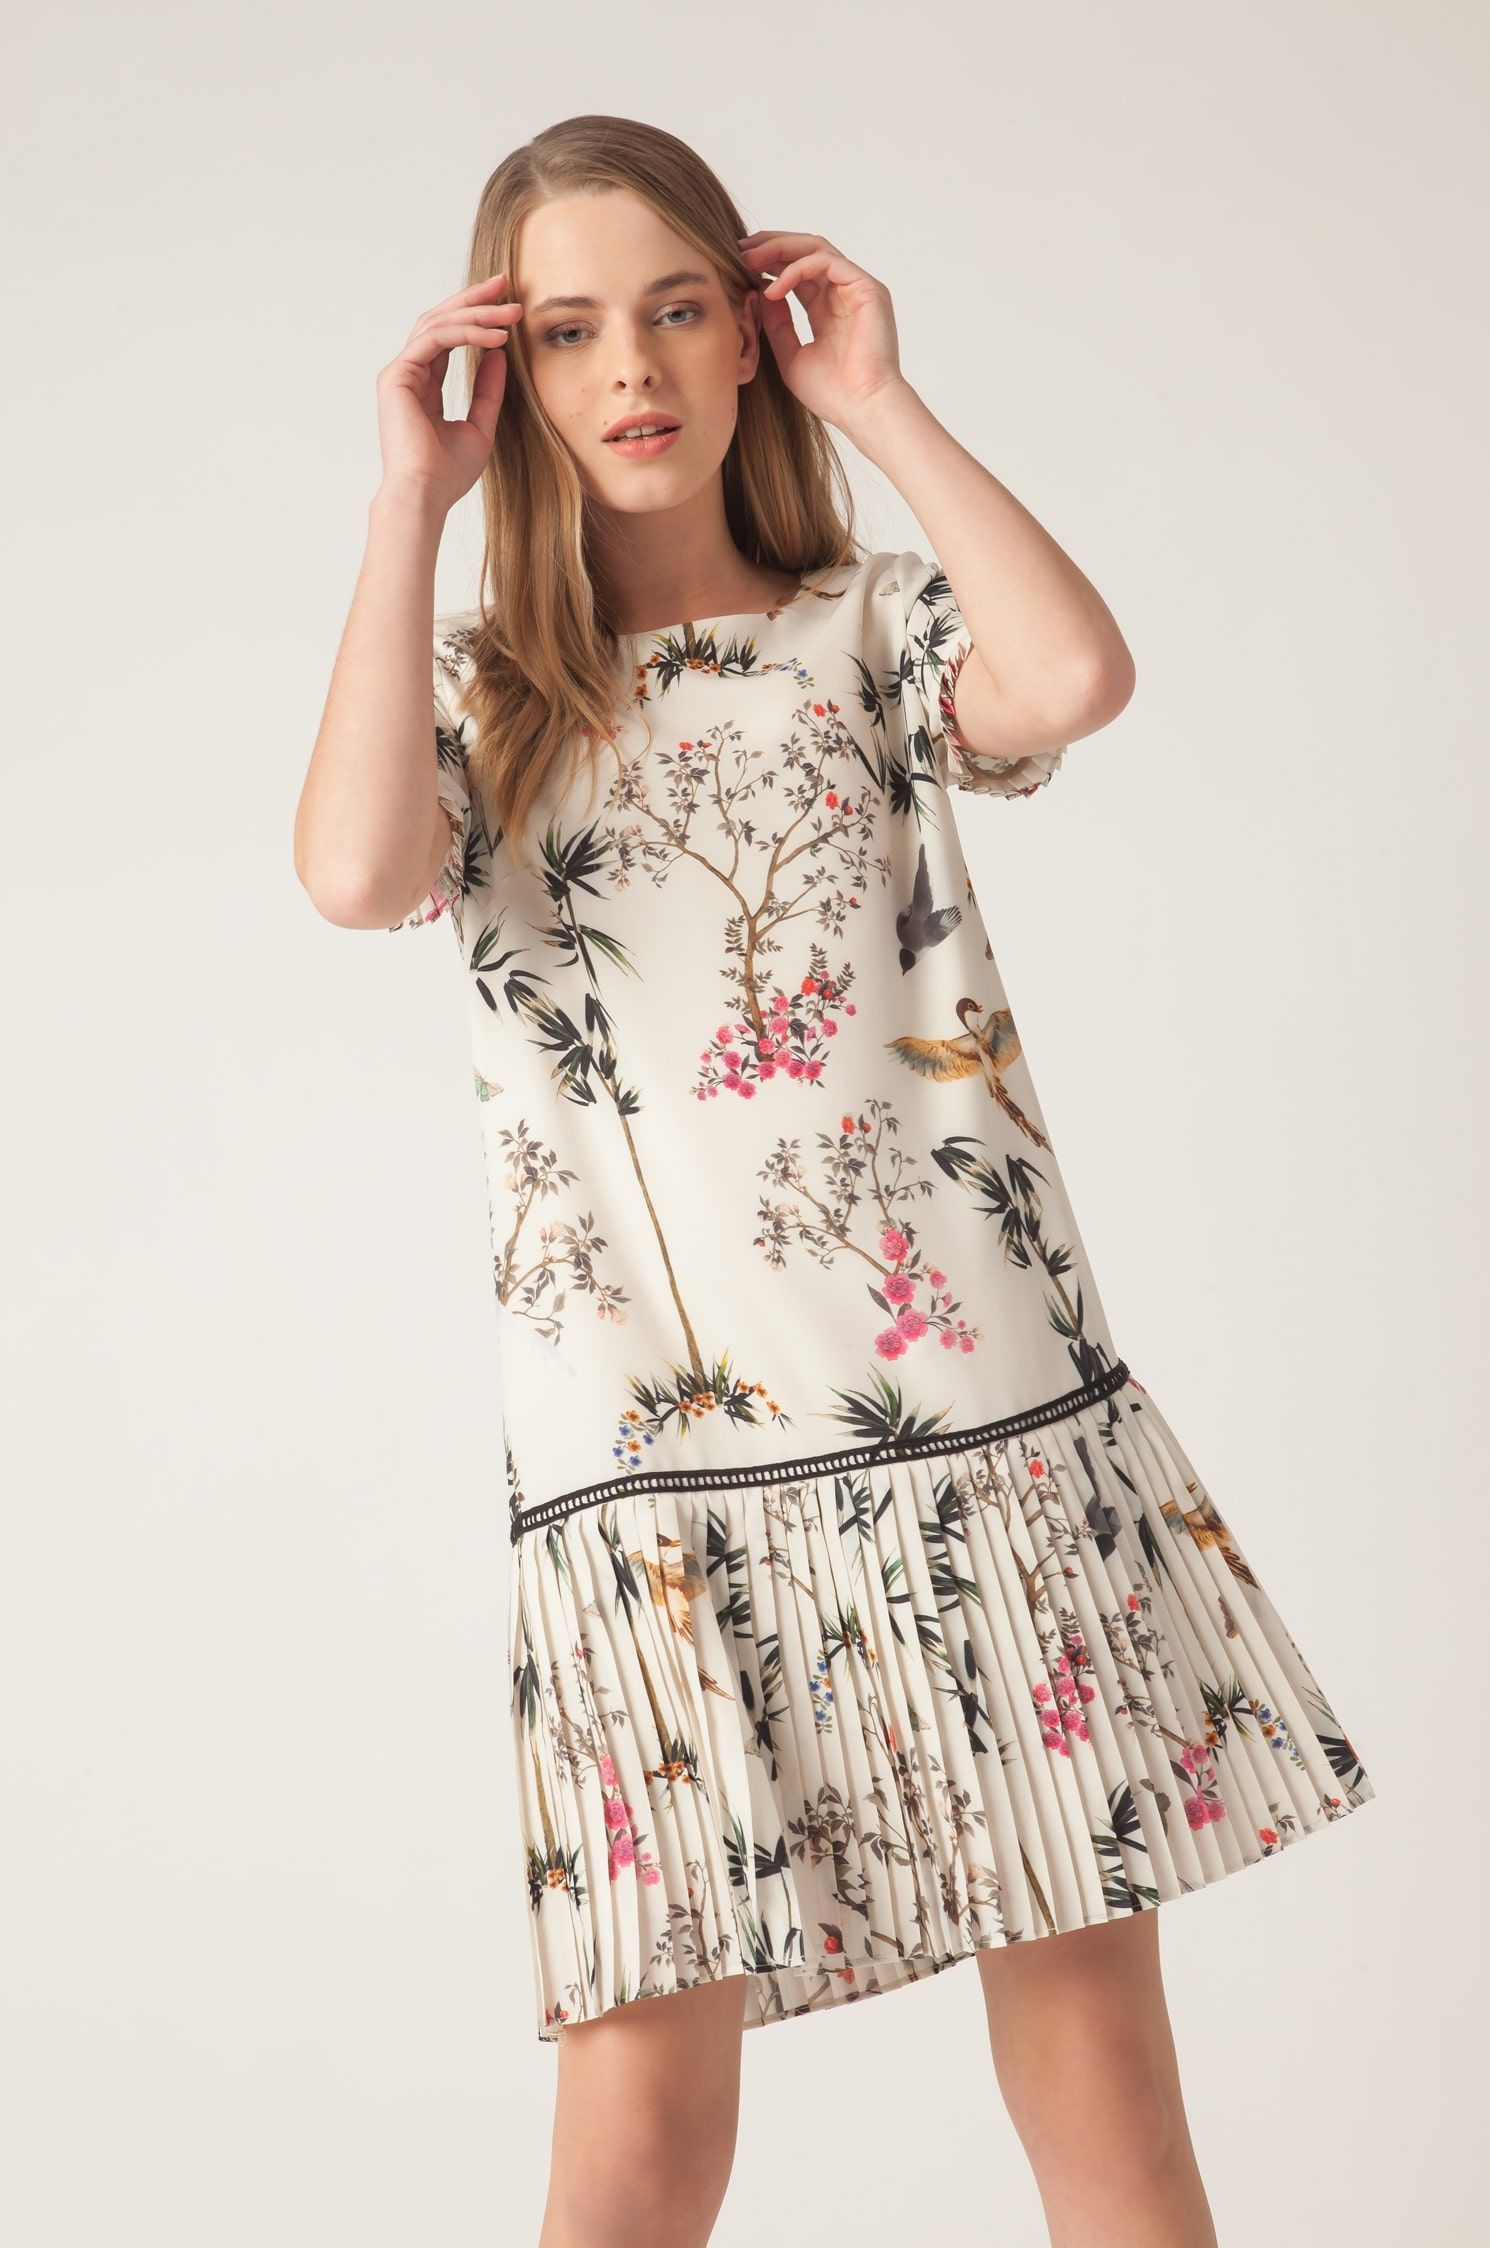 b336e33d W2019 Solar Sukienka - Sukienki - Ubrania | Sukienki w 2019 ...